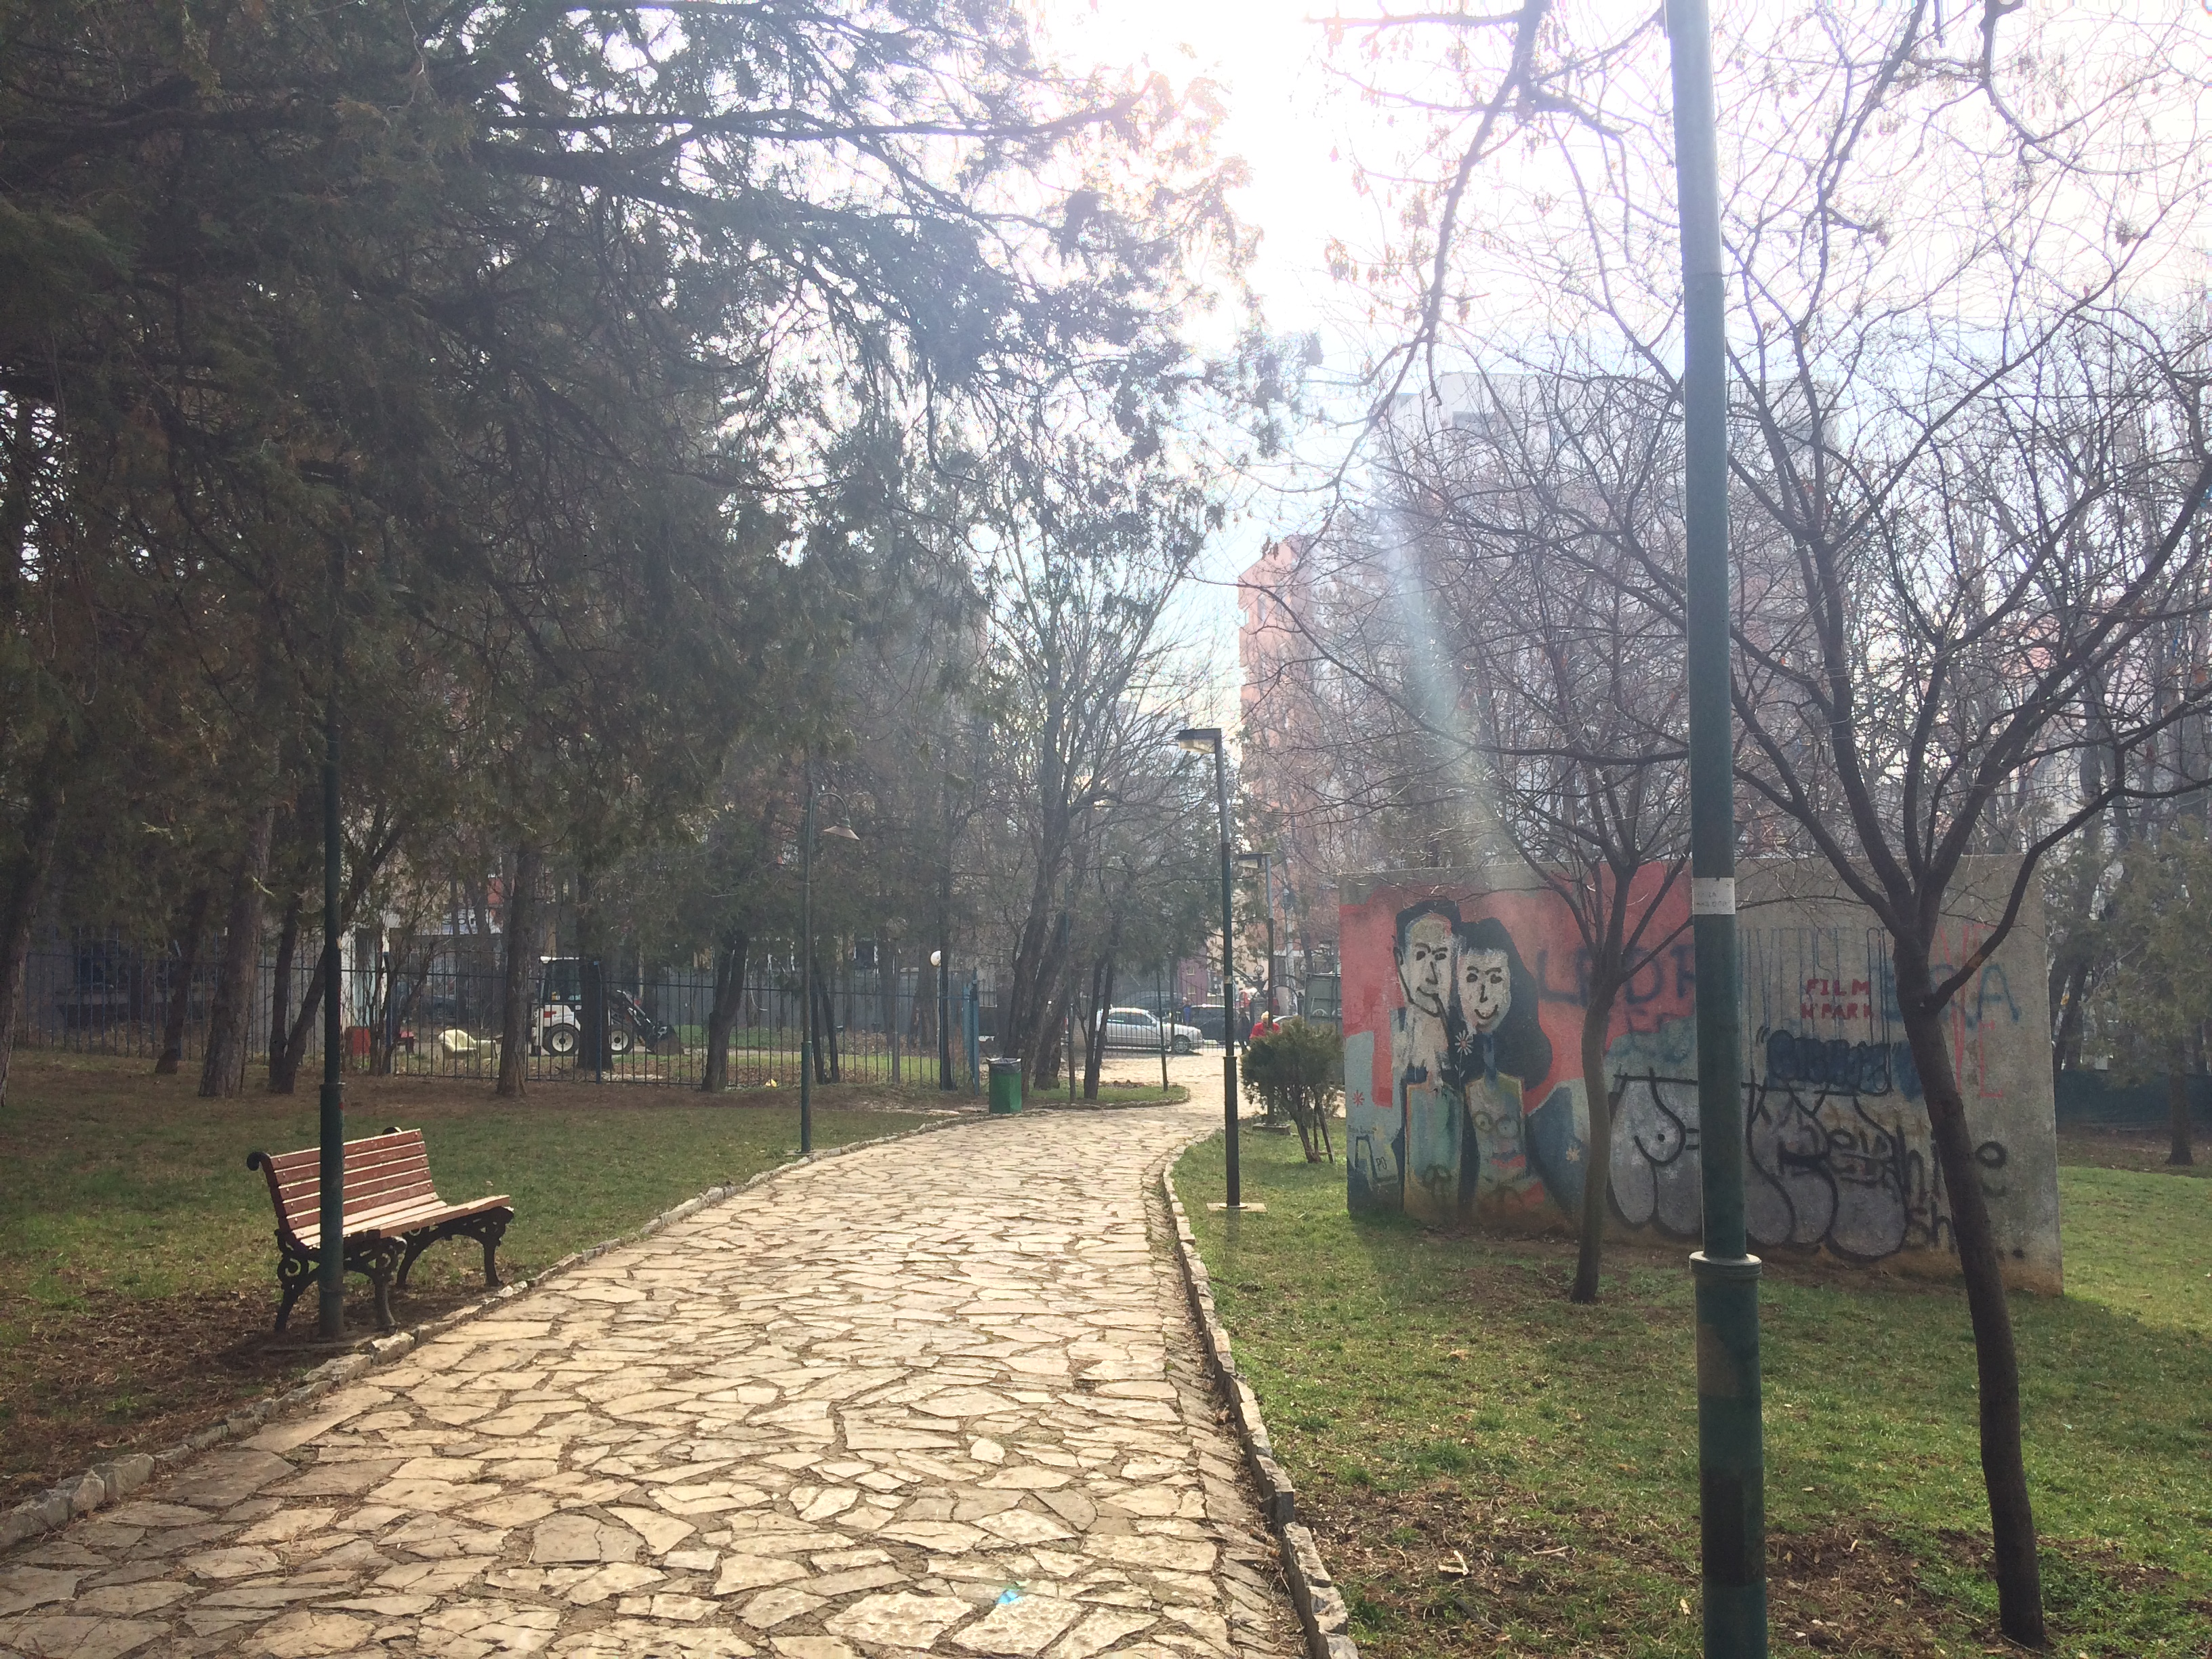 Pristina City ParkPristina, KoPristina, Kosovo, City Park